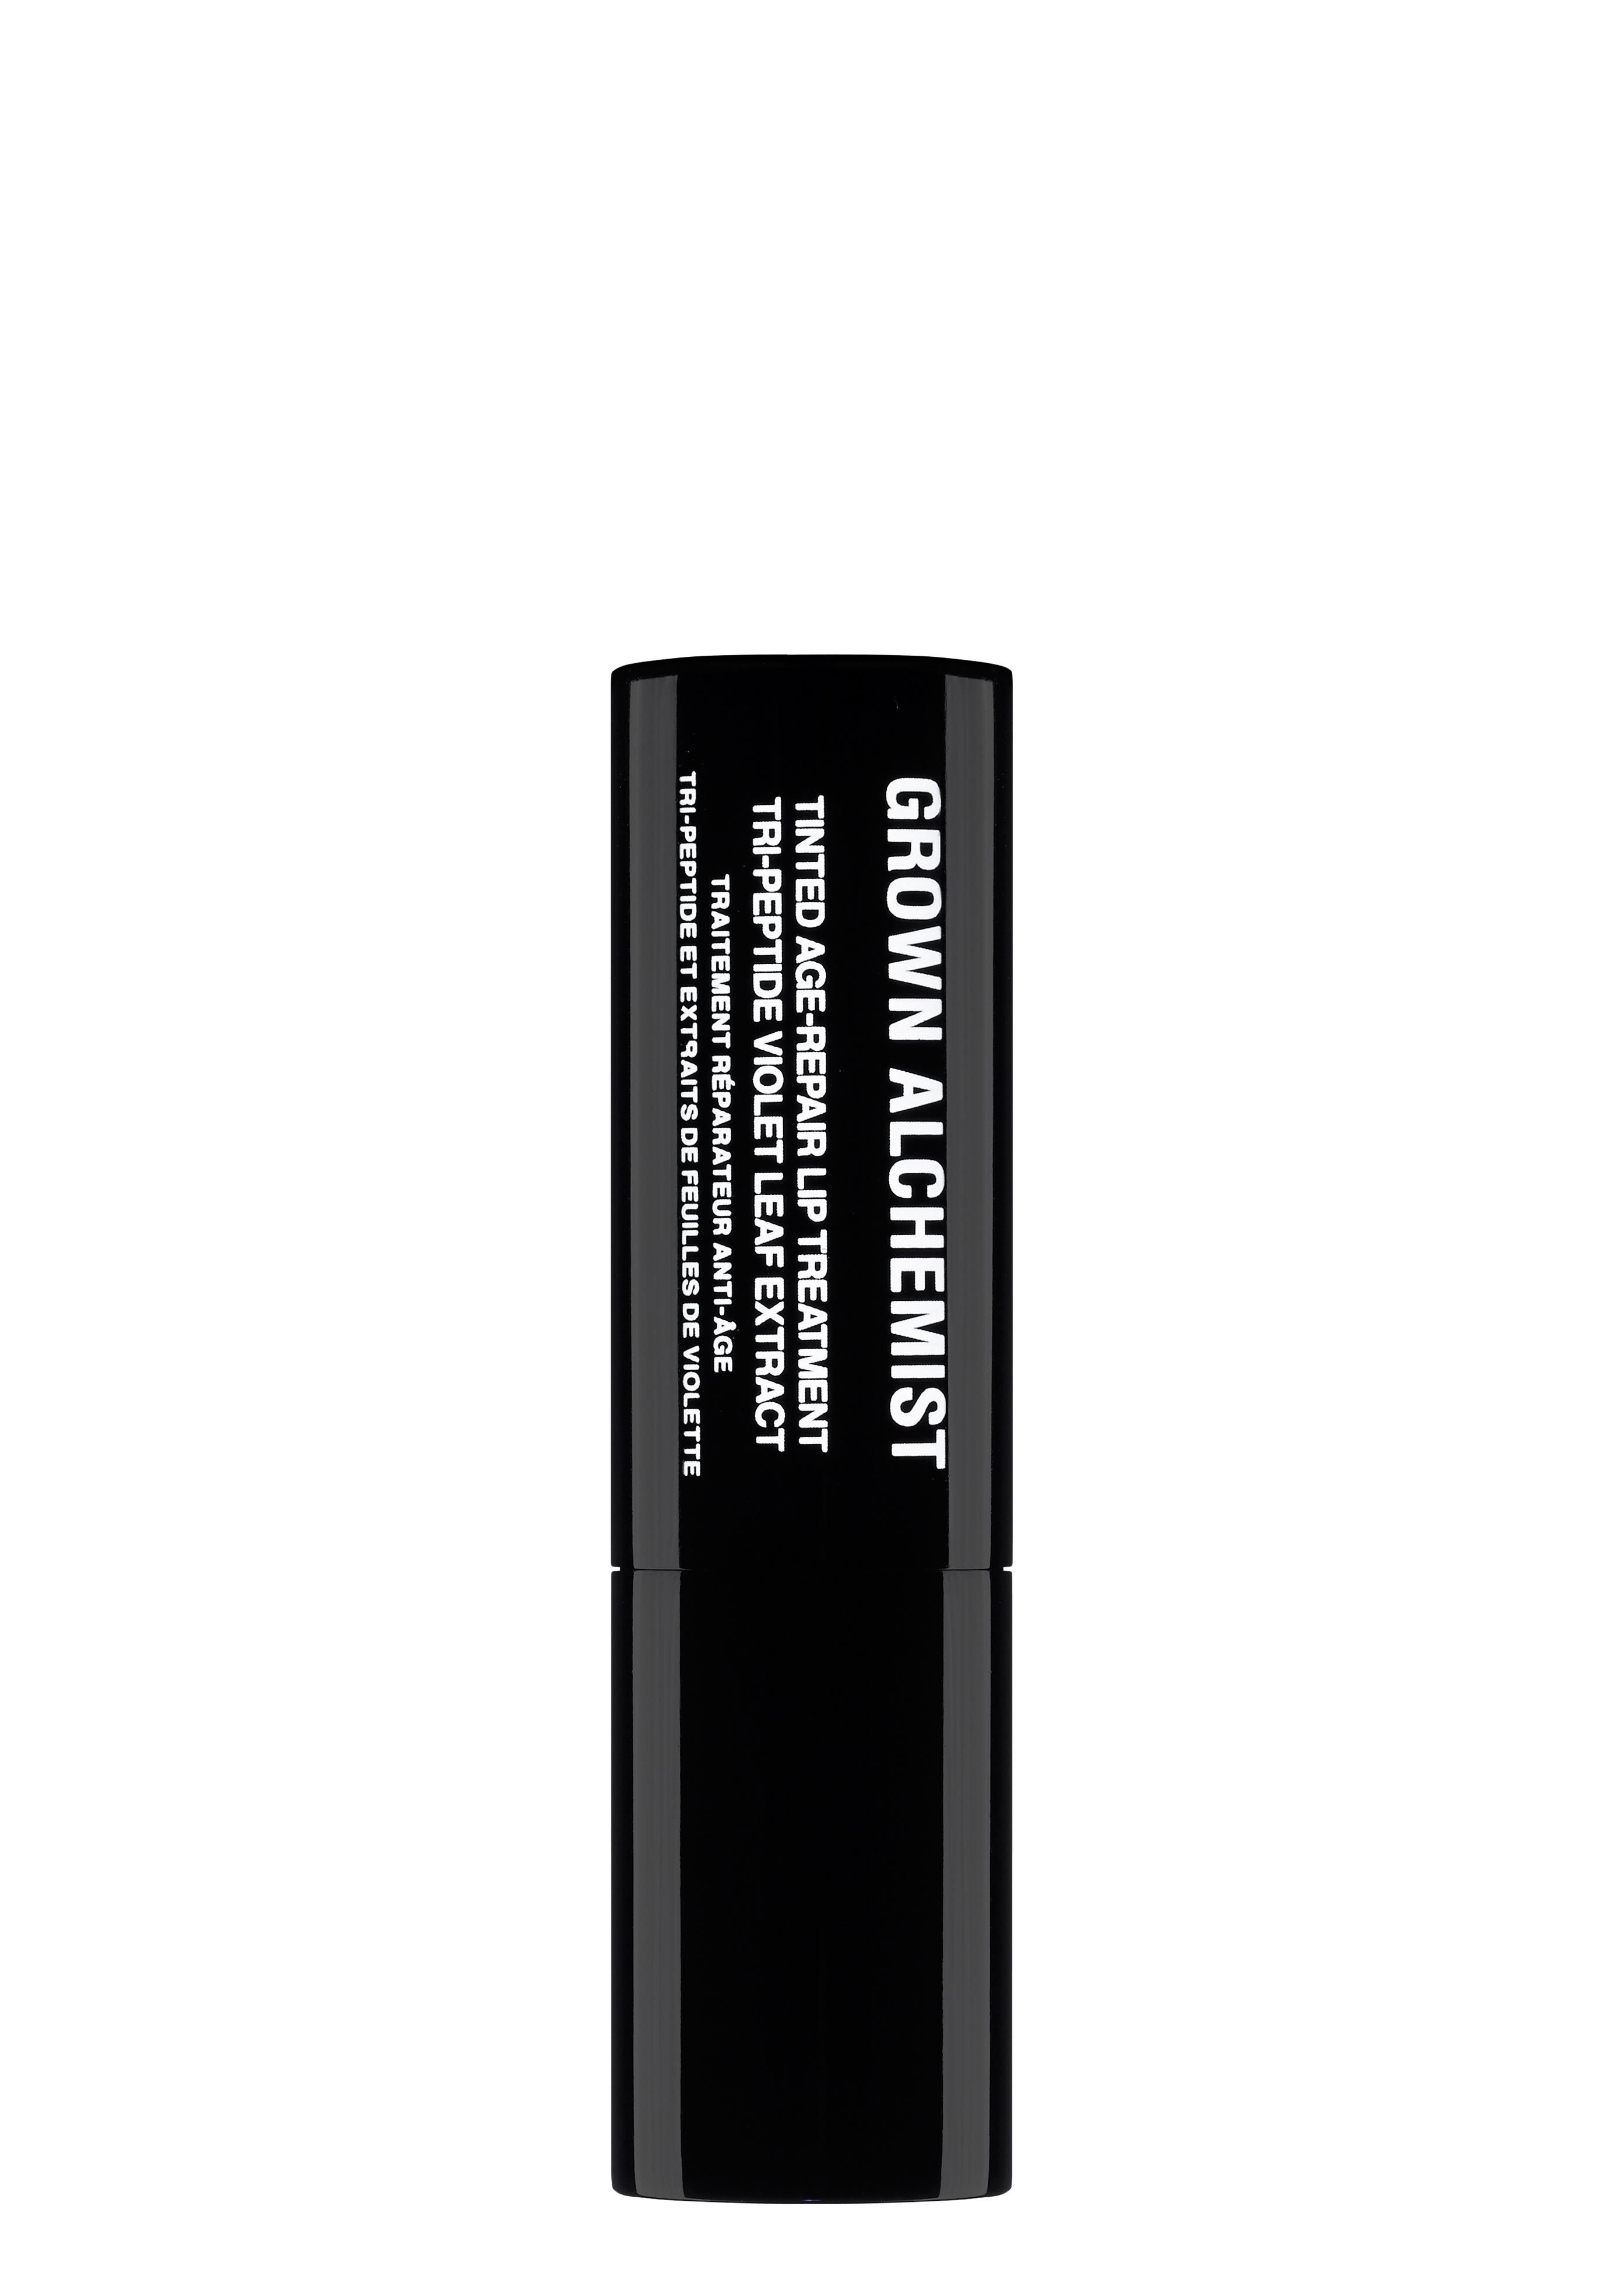 Tinted Age-Repair Lip Treatment Grown Alchemist Tinted Age-Repair Lip Treatment